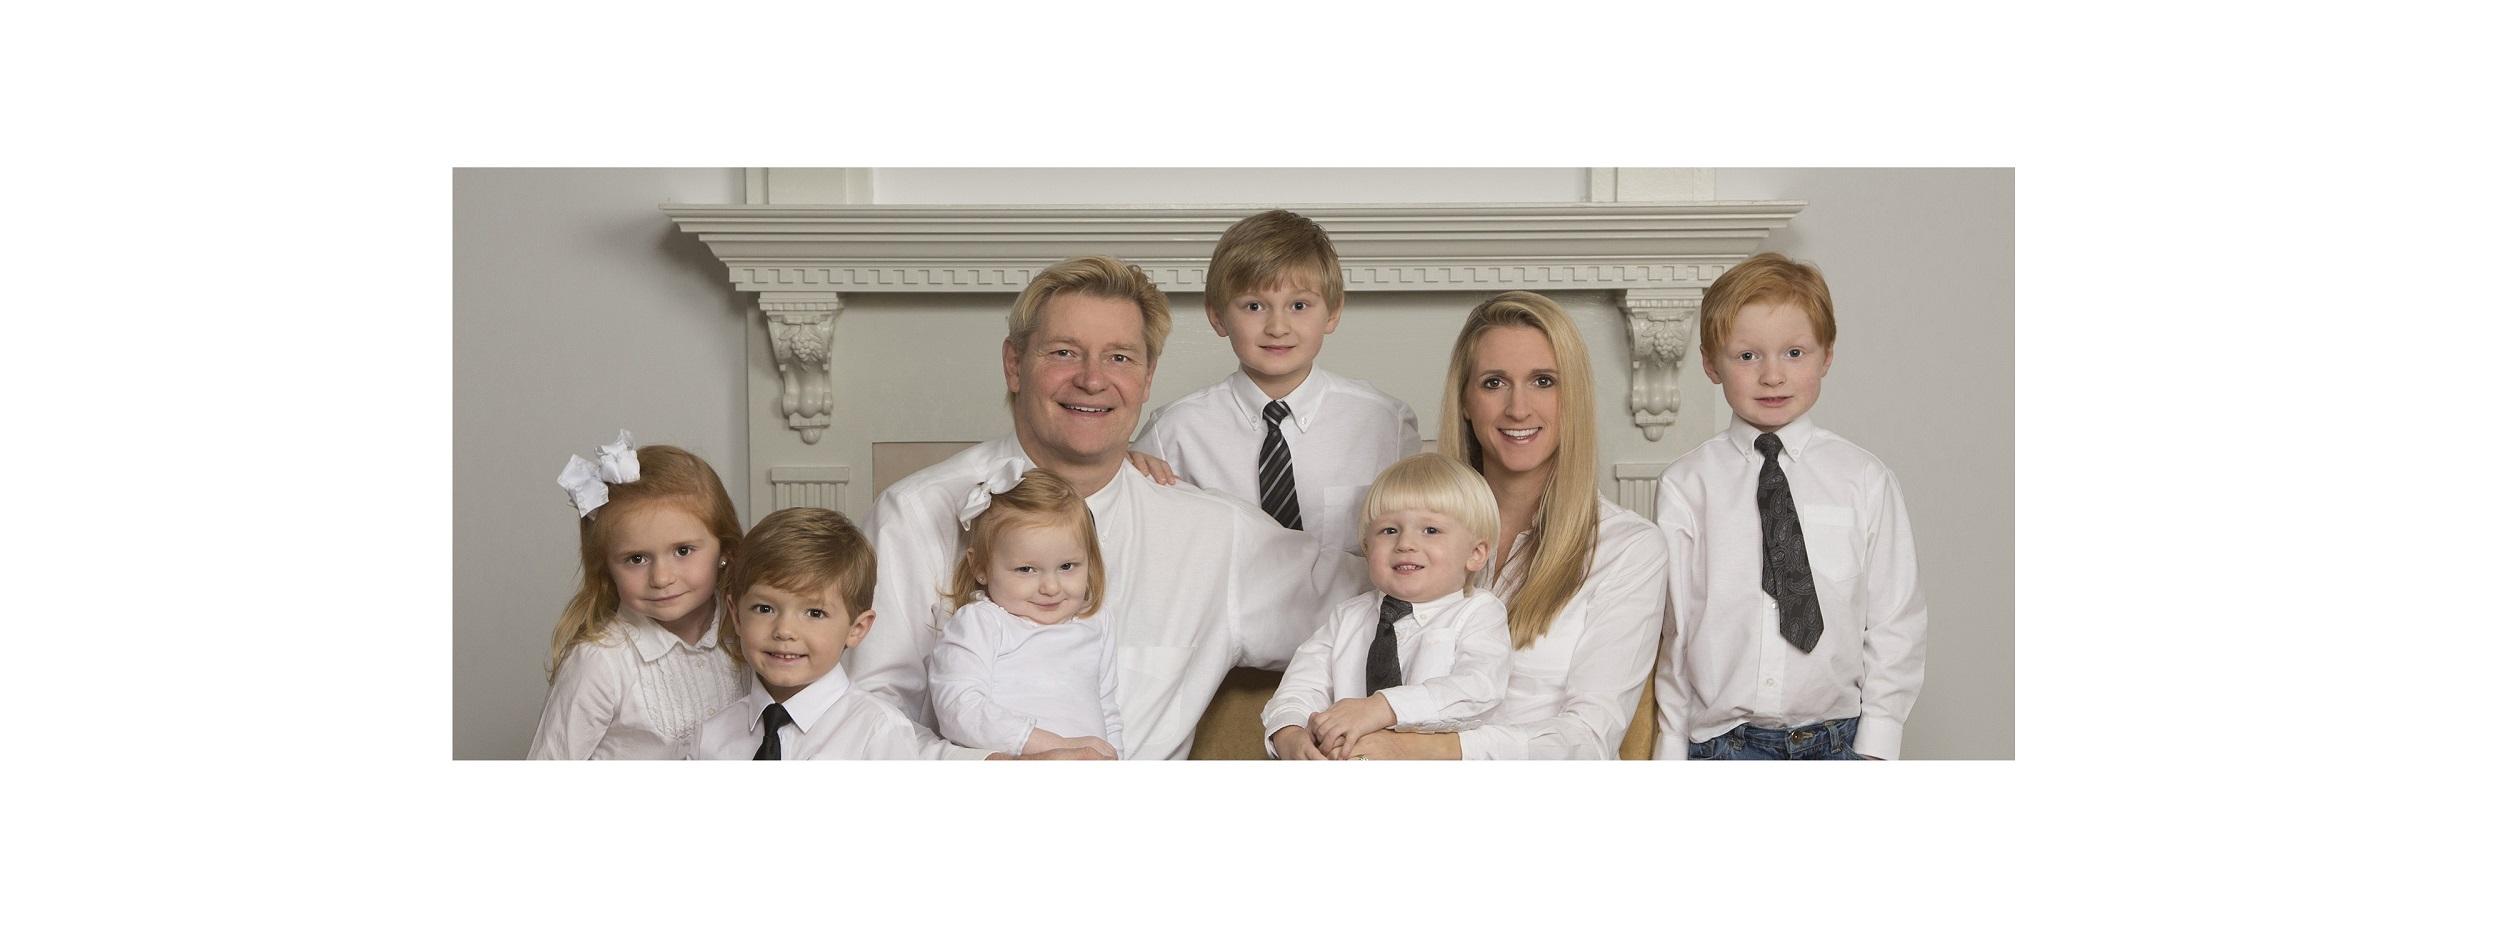 Frank Lesinski | Francis Lesinski Family